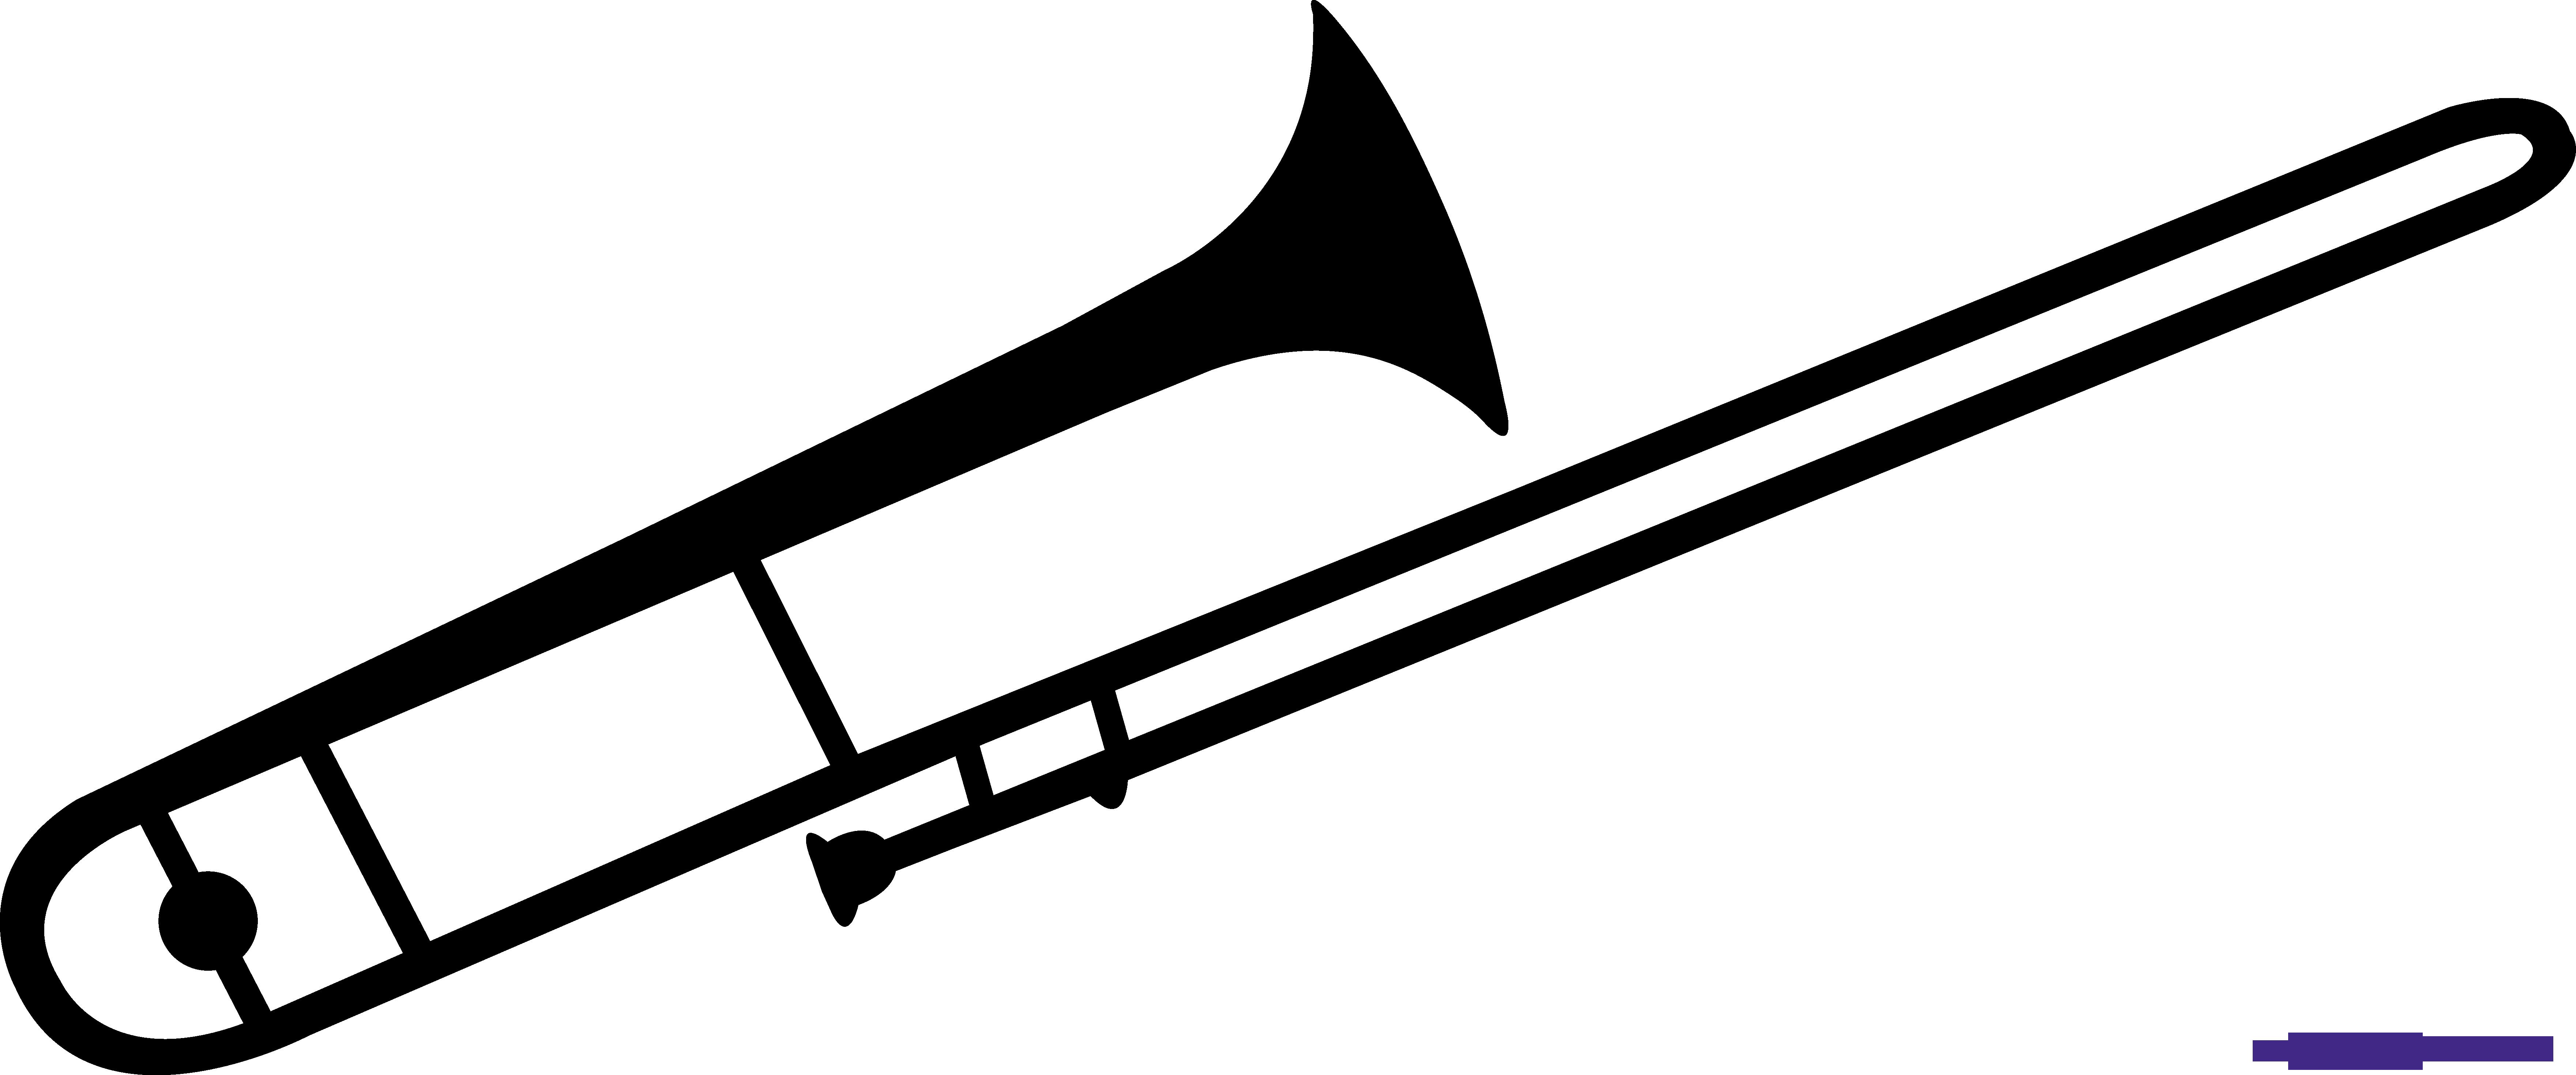 Trombone clipart black and white. Silhouette sweet clip art